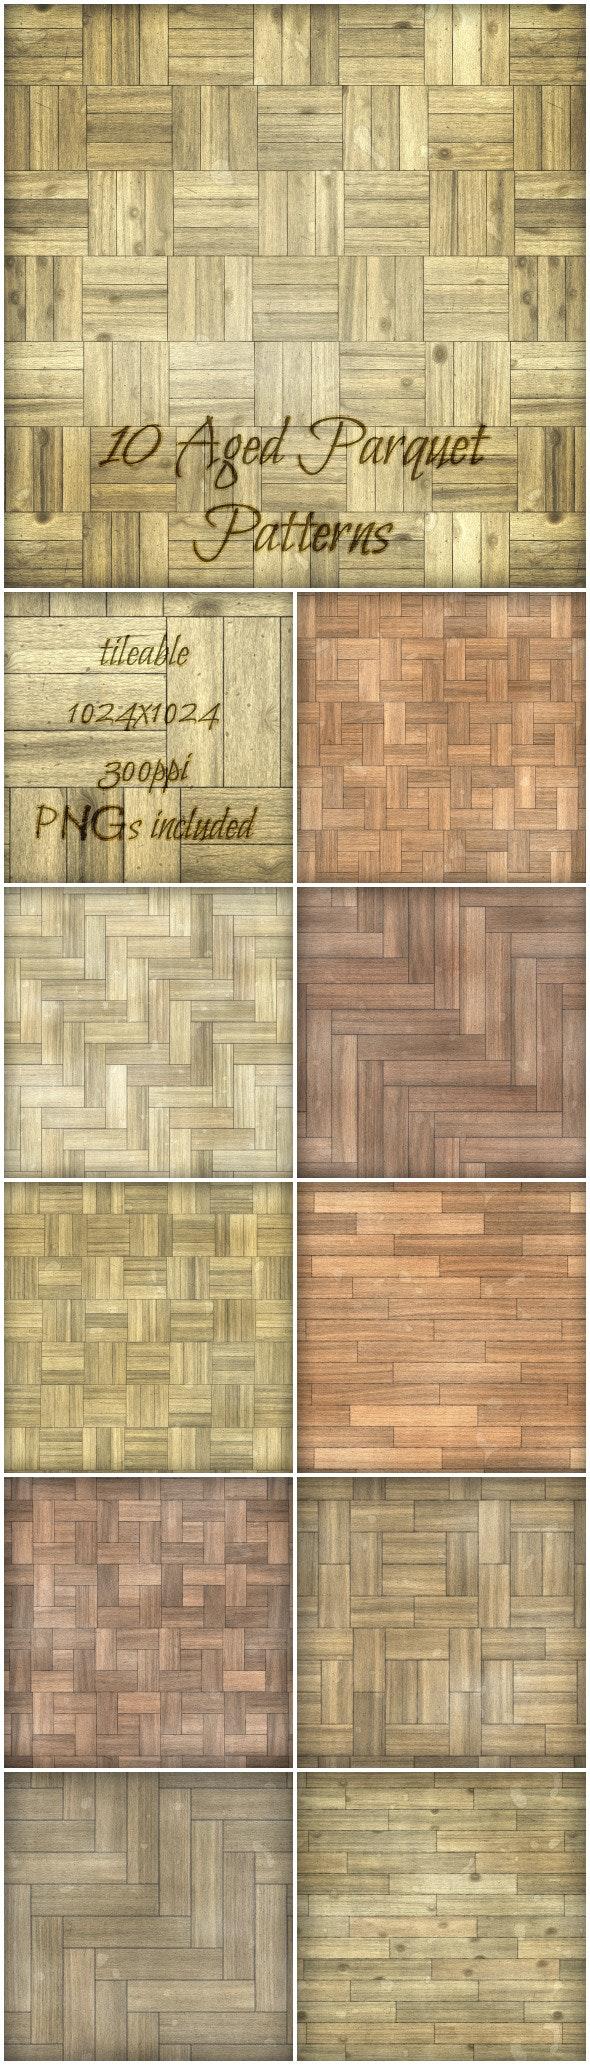 10 Aged Parquet Patterns - Miscellaneous Textures / Fills / Patterns